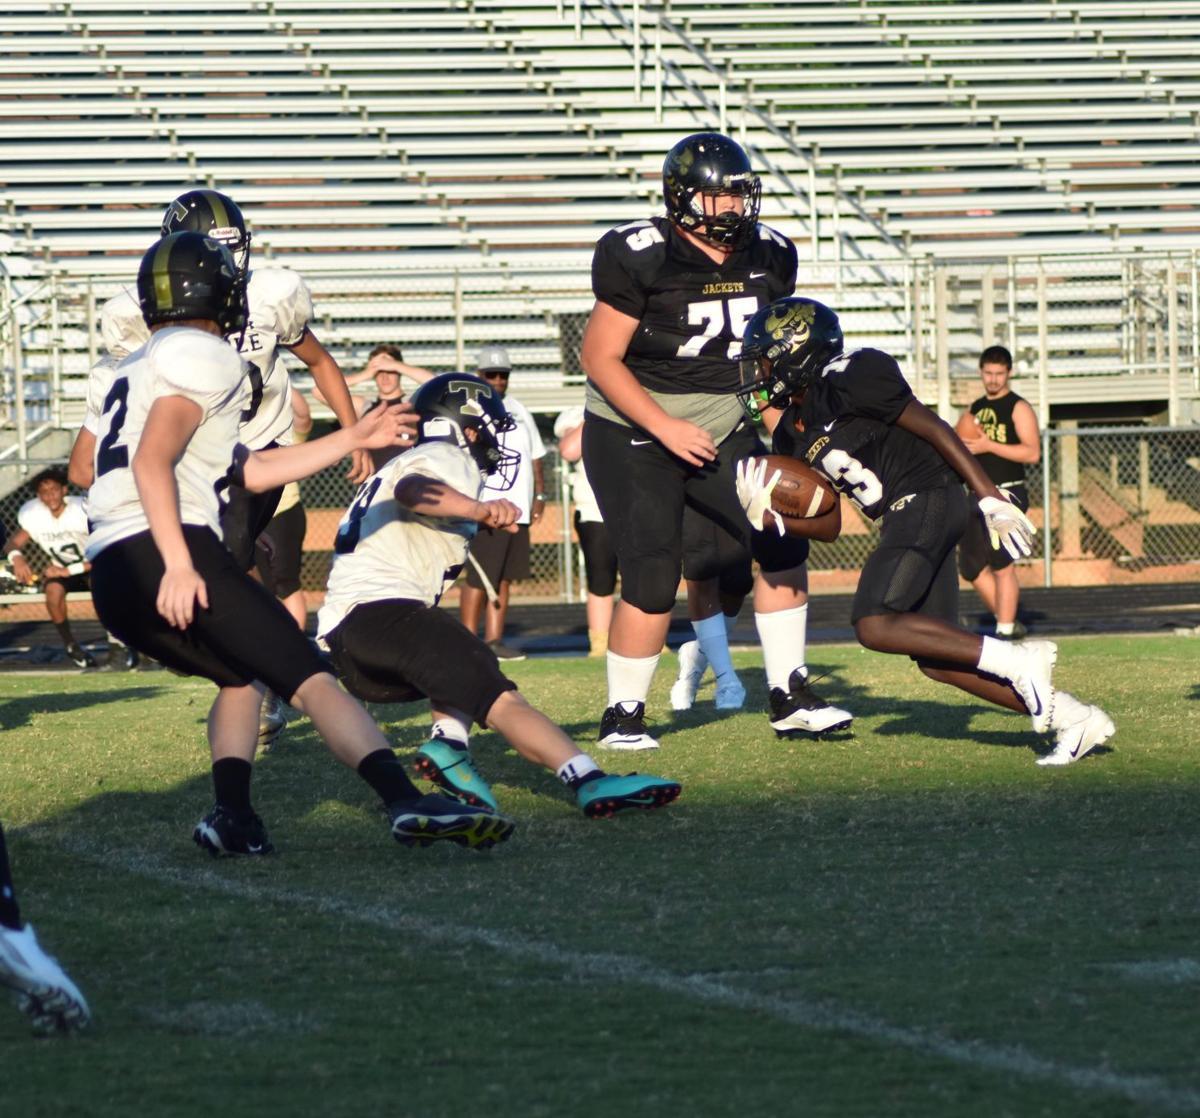 Rockmart JV football takes win over Temple | Georgia News